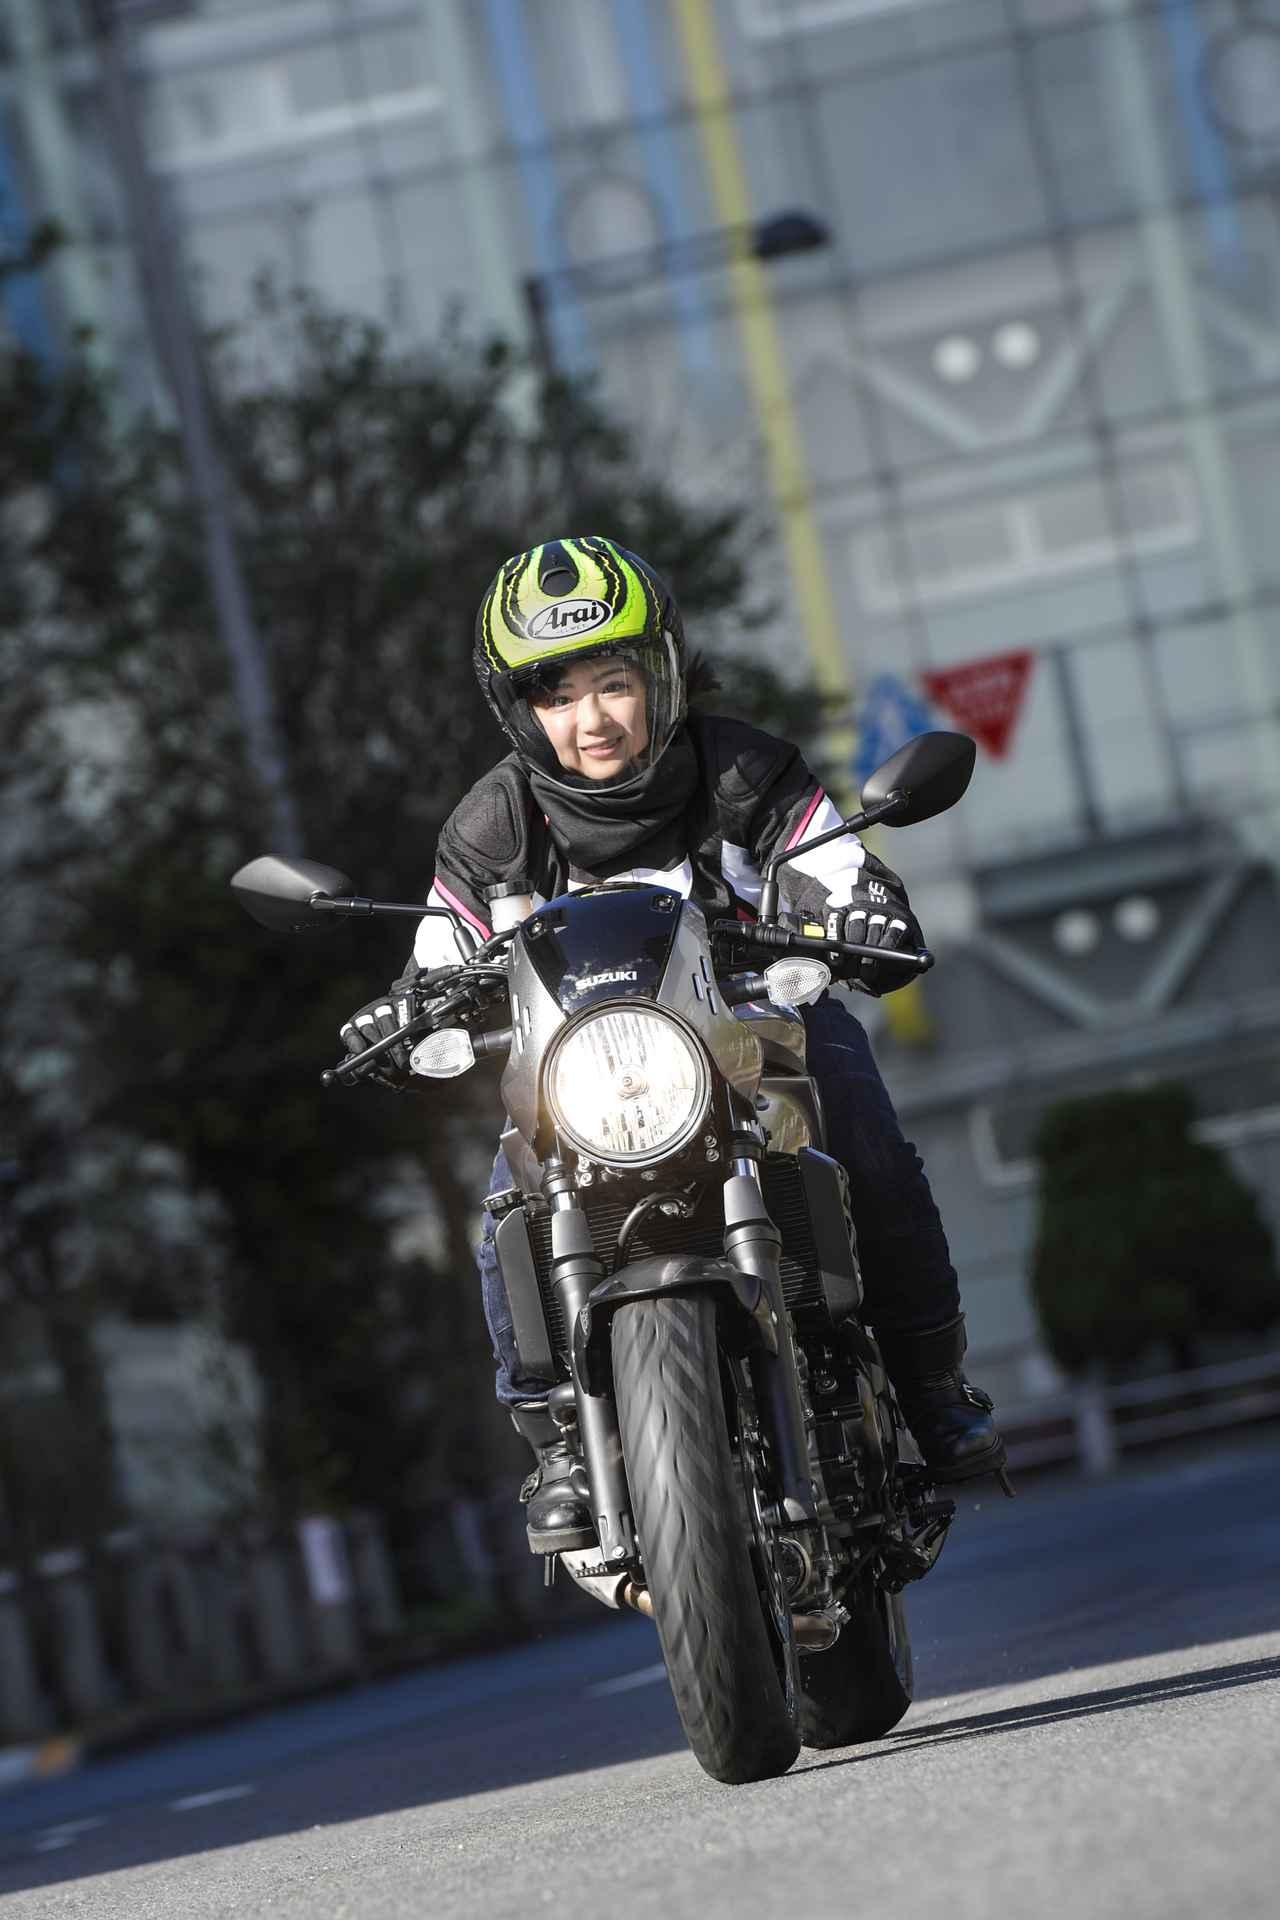 Images : 5番目の画像 - 平嶋夏海 × スズキSV650 ABS・SV650X ABS 写真をもっと見る! - LAWRENCE - Motorcycle x Cars + α = Your Life.